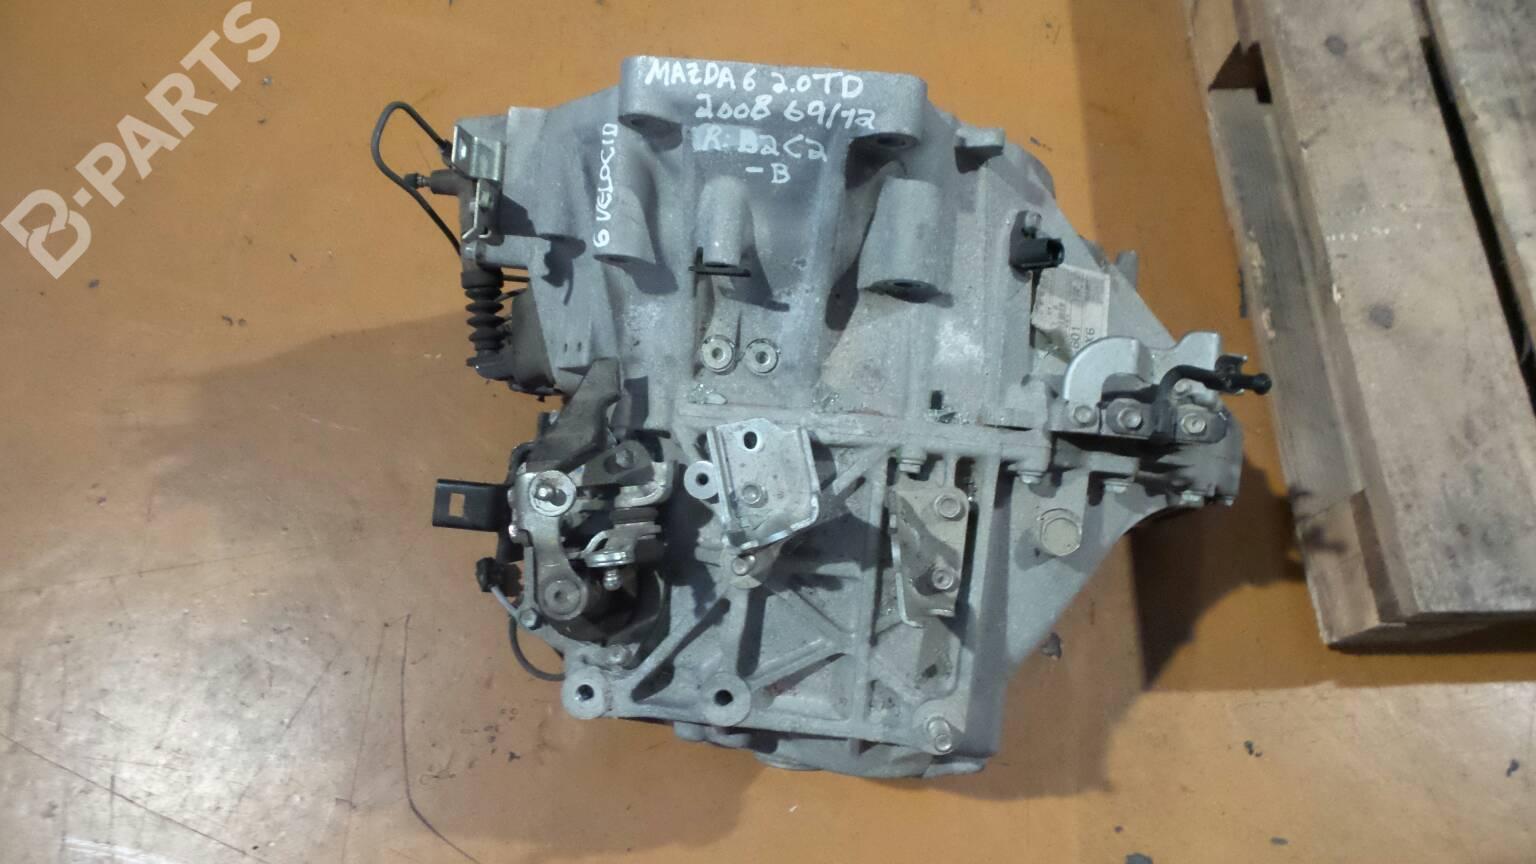 Manual Gearbox Mazda 5 Cr19 20 Cd 28445 2007 626 2 0 Engine Parts Diagram D2c4 B 143hp